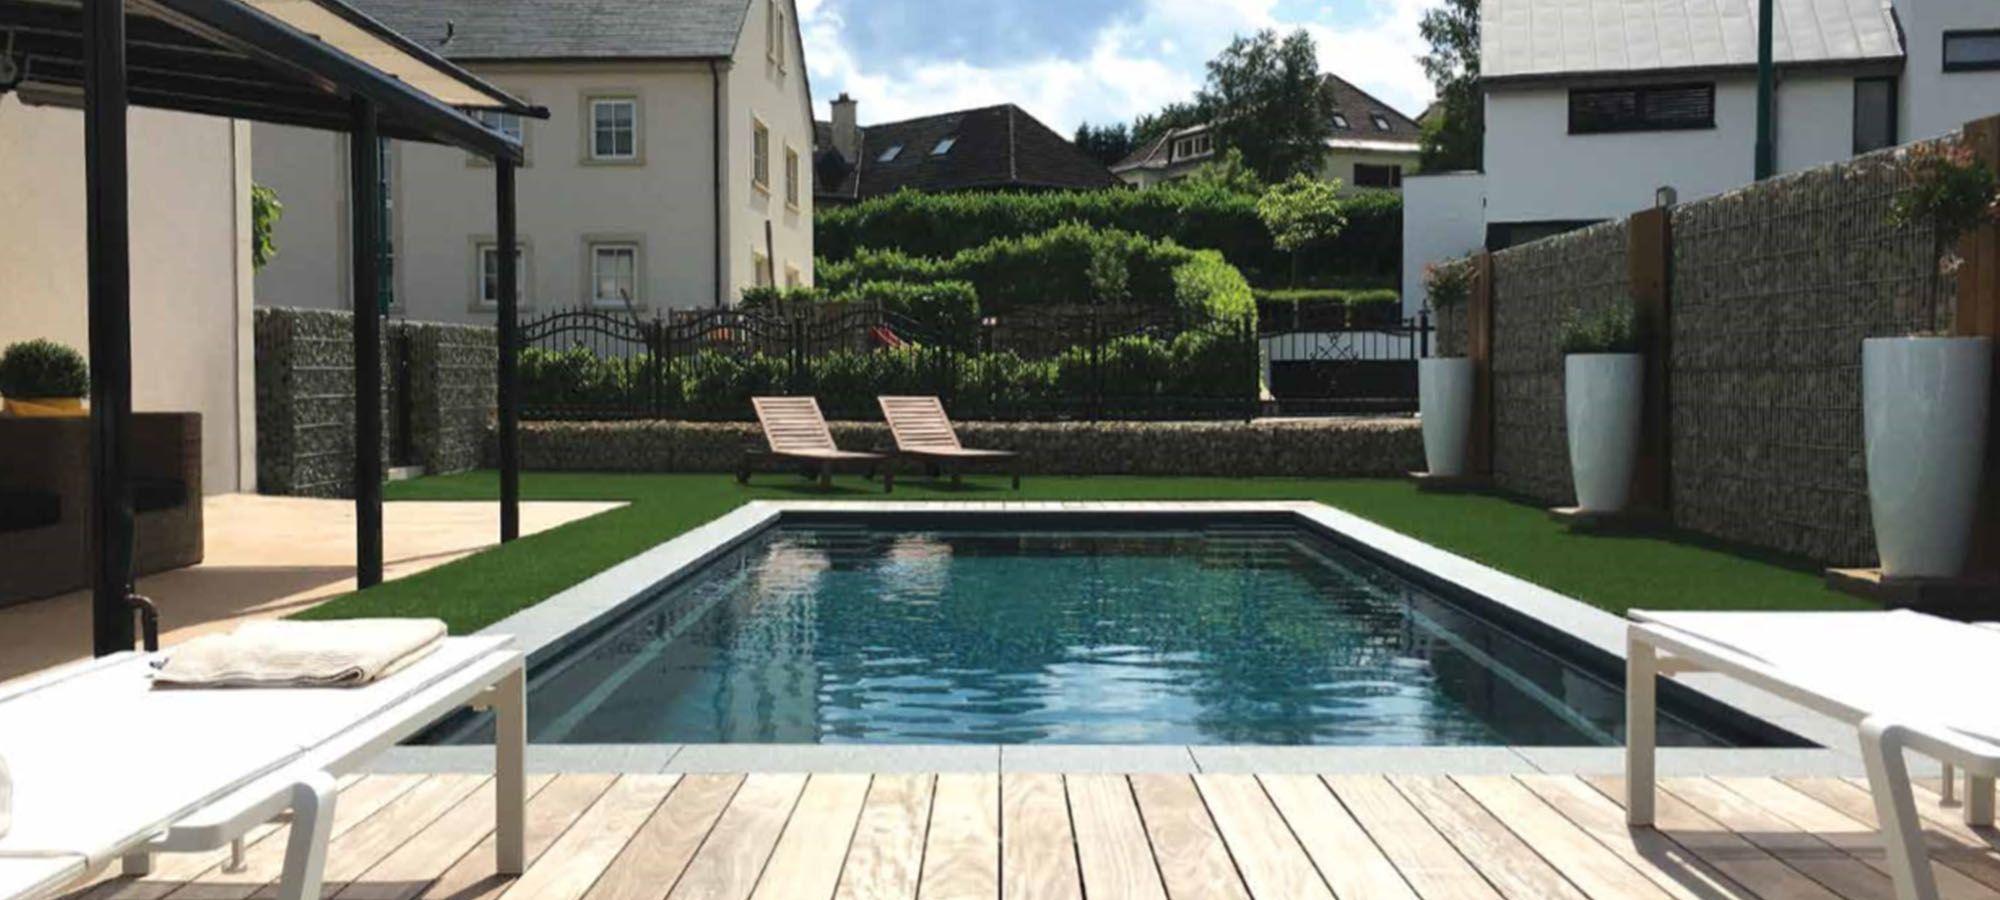 Freedom Pool Designs